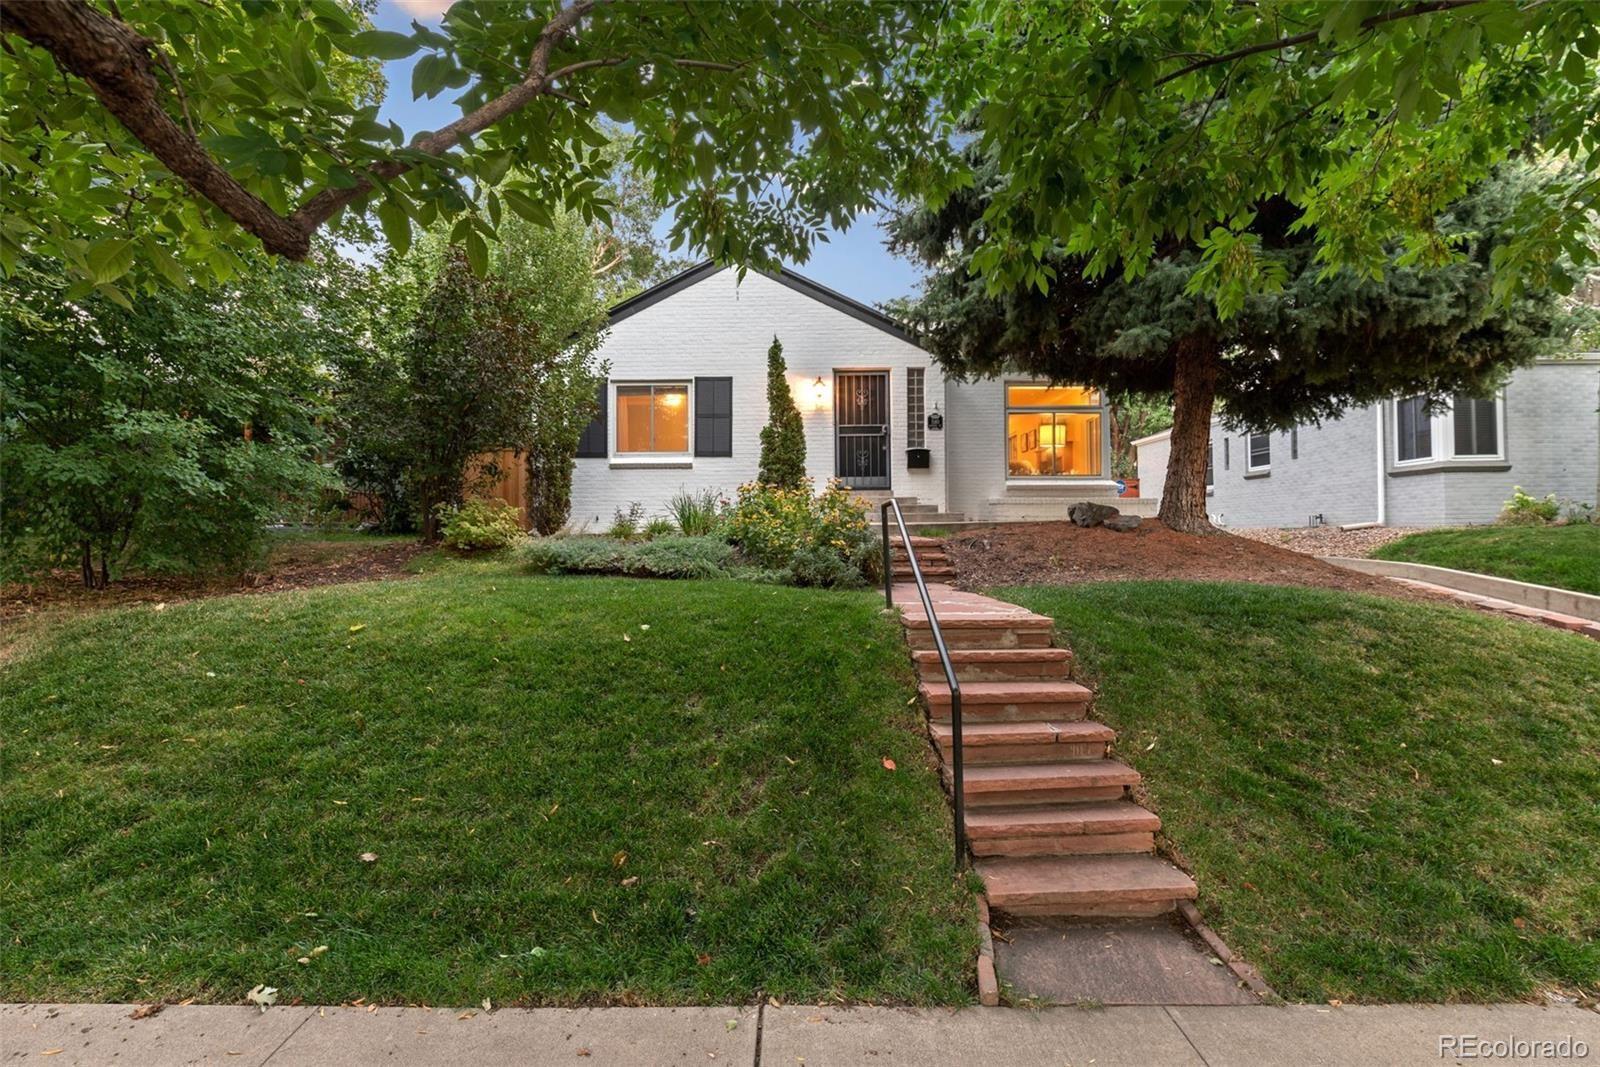 Photo of 1140 Glencoe Street, Denver, CO 80220 (MLS # 6952469)